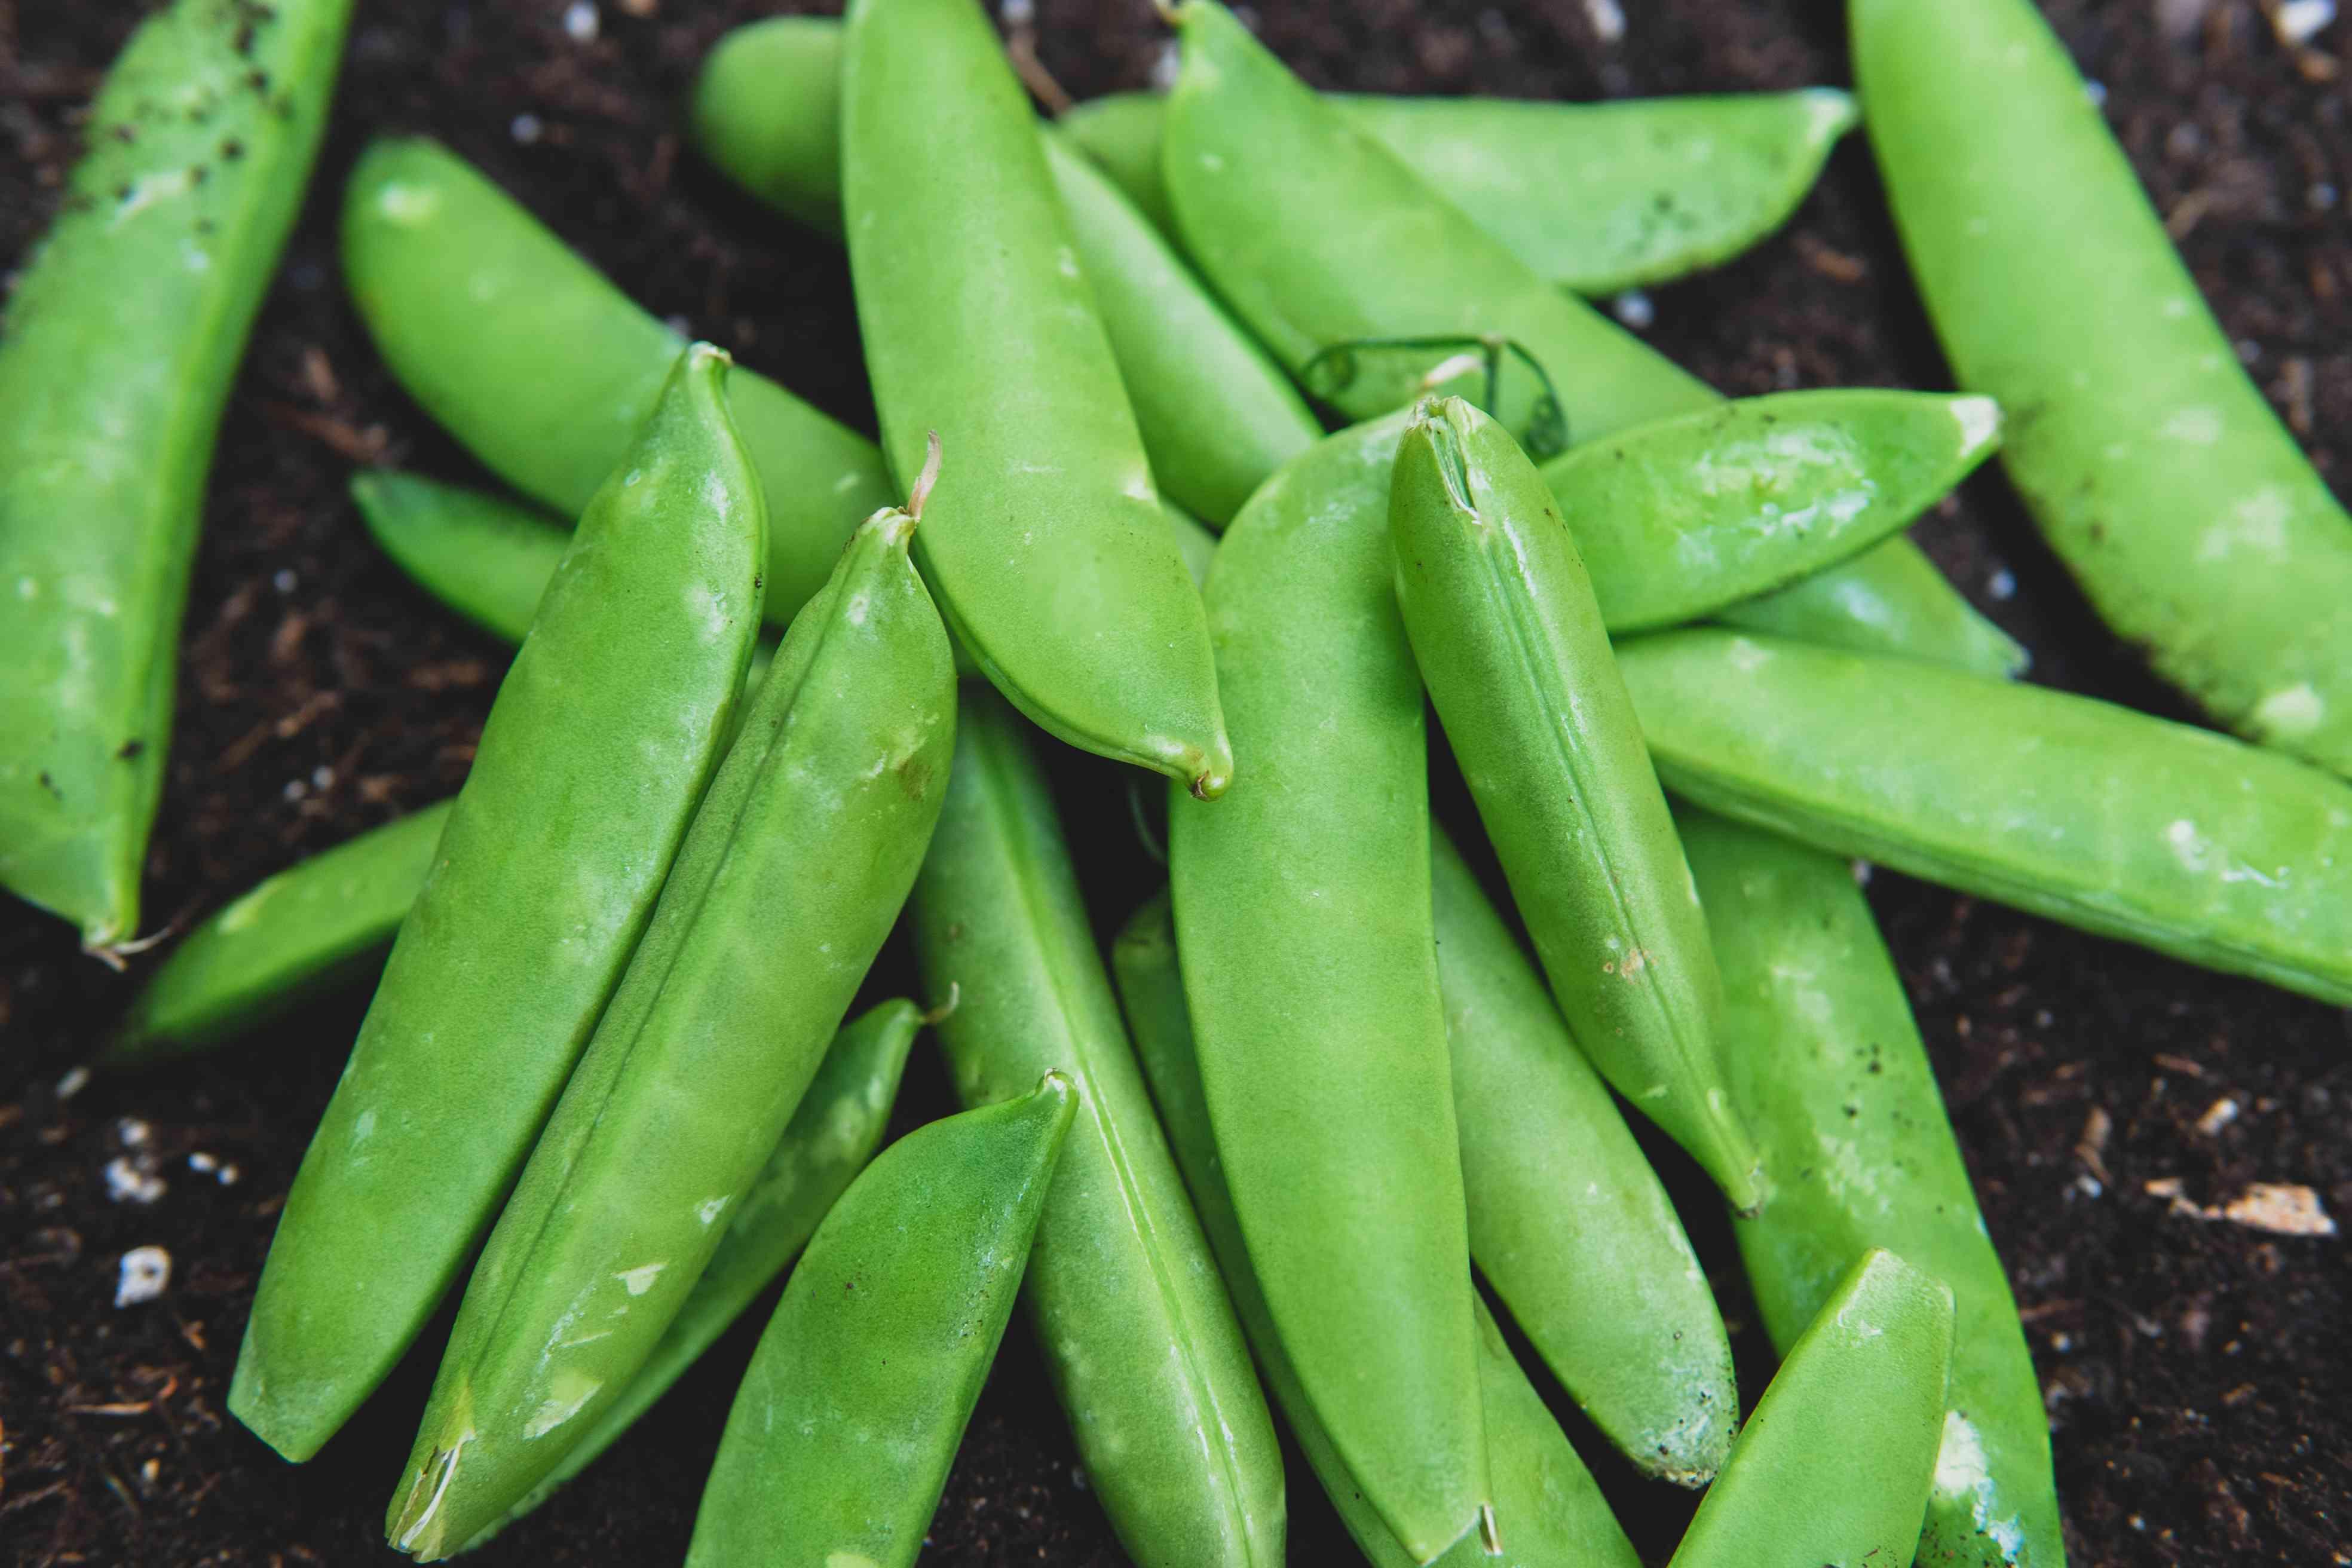 bright green sugar snap peas on black dirt